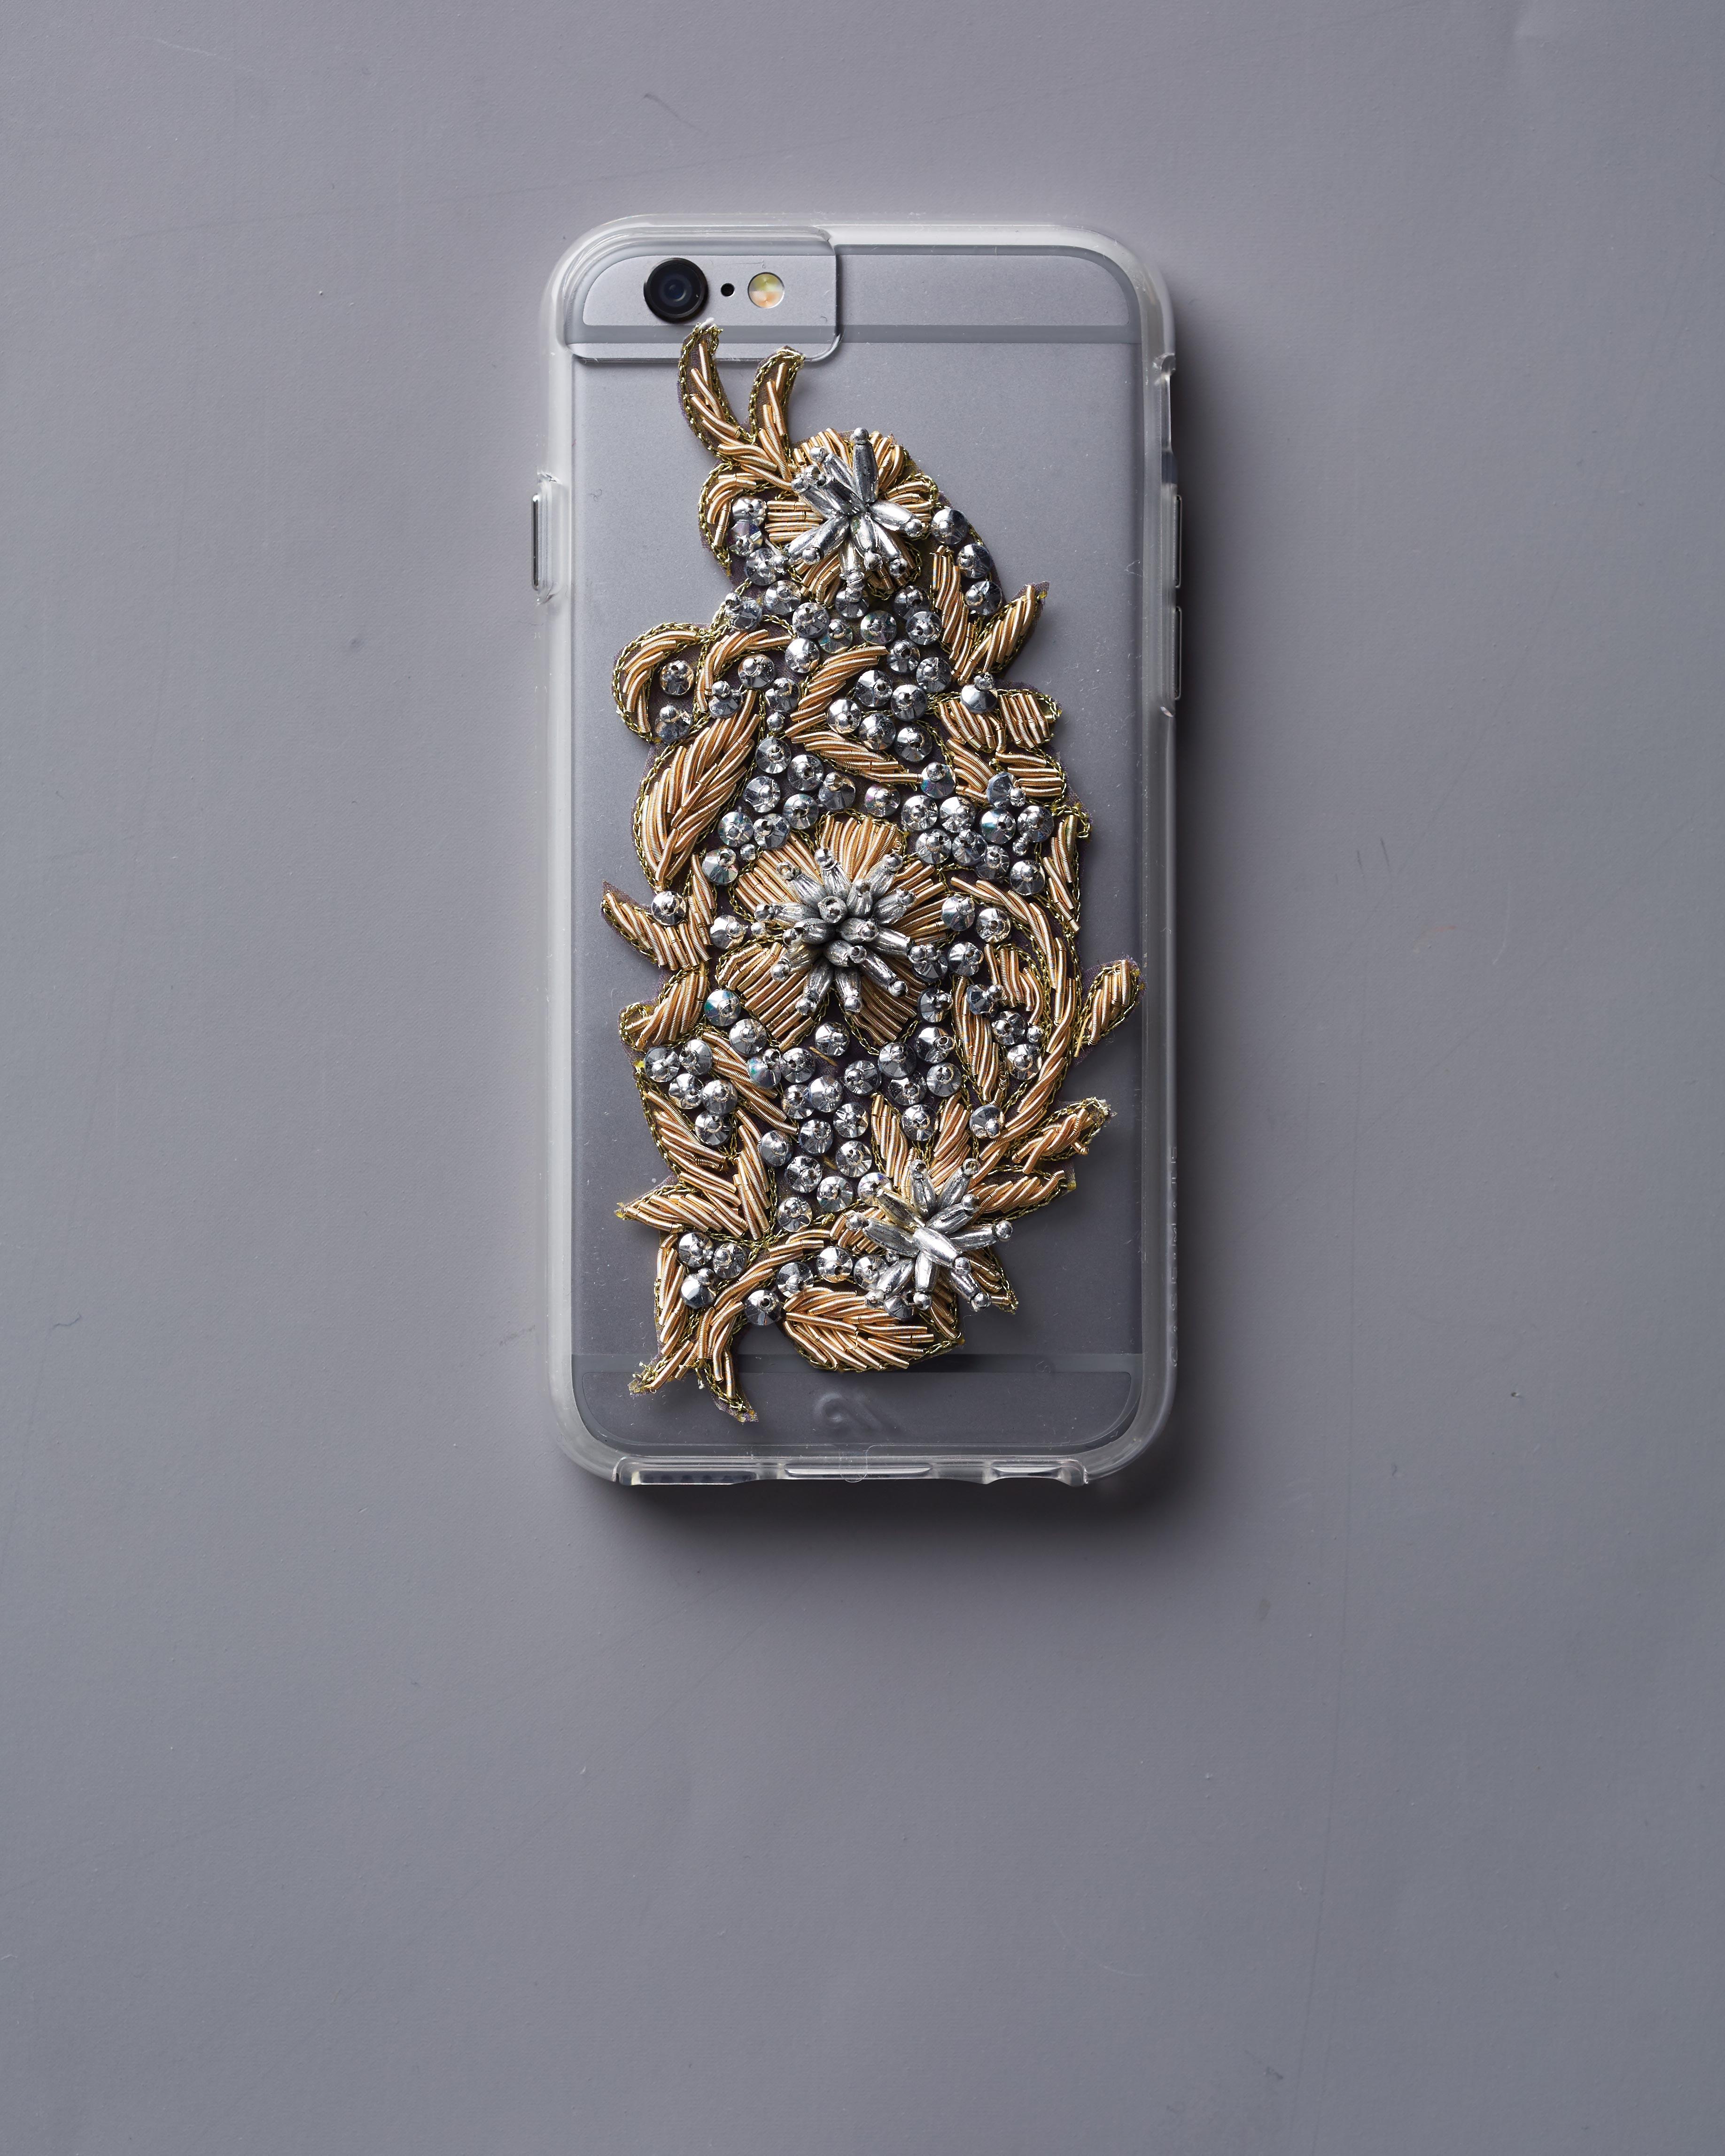 applique cellphone case mate